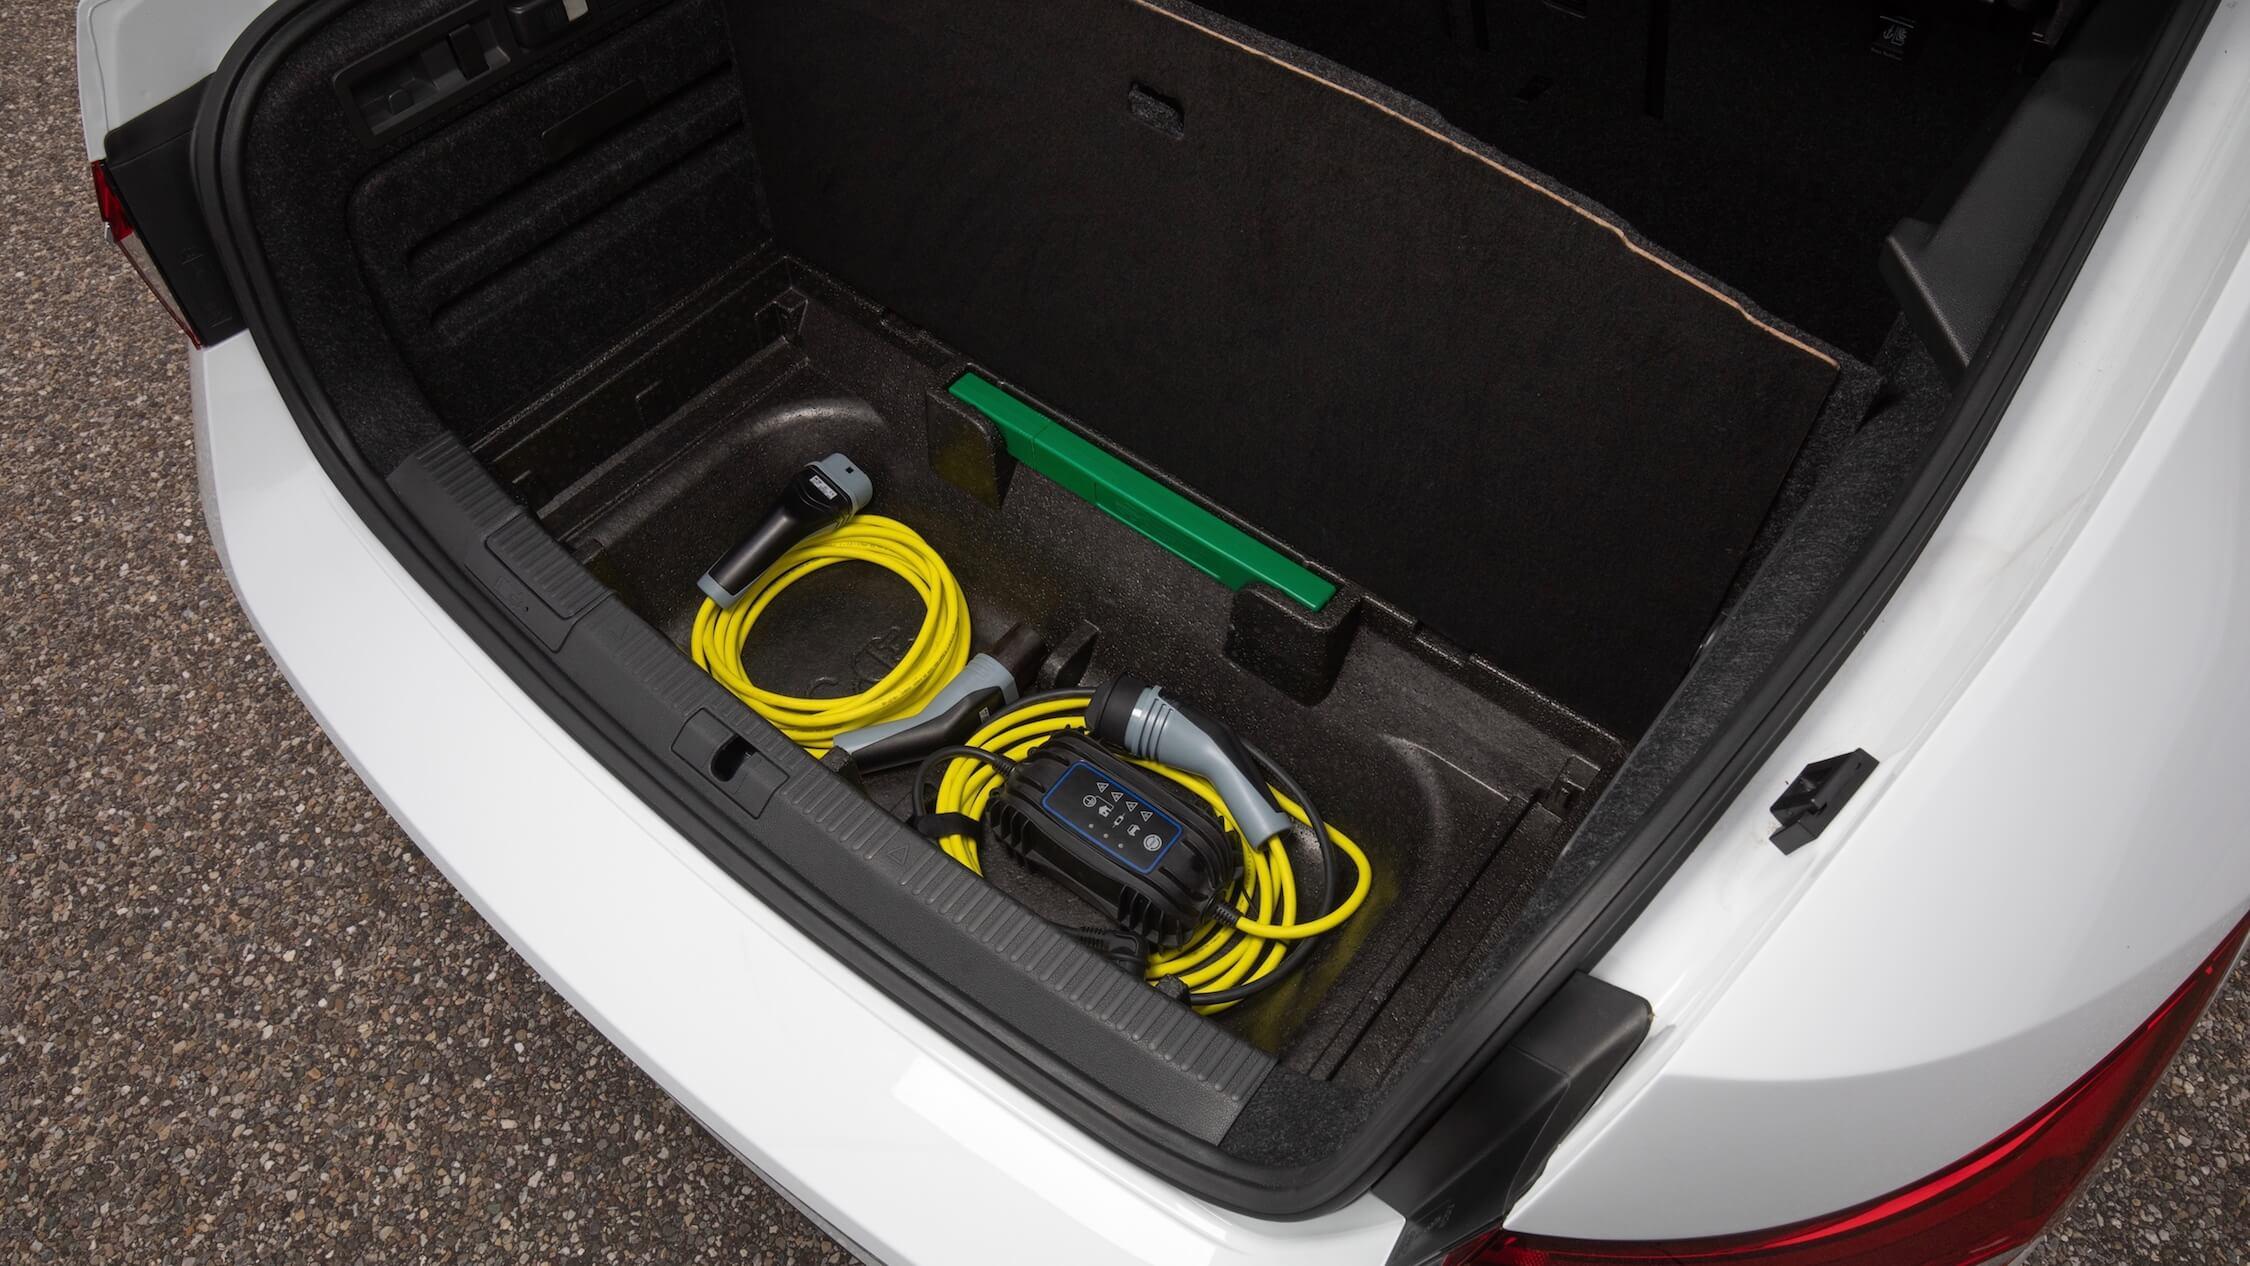 plug-in hybride Skoda Superb opbergruimte laadkabels